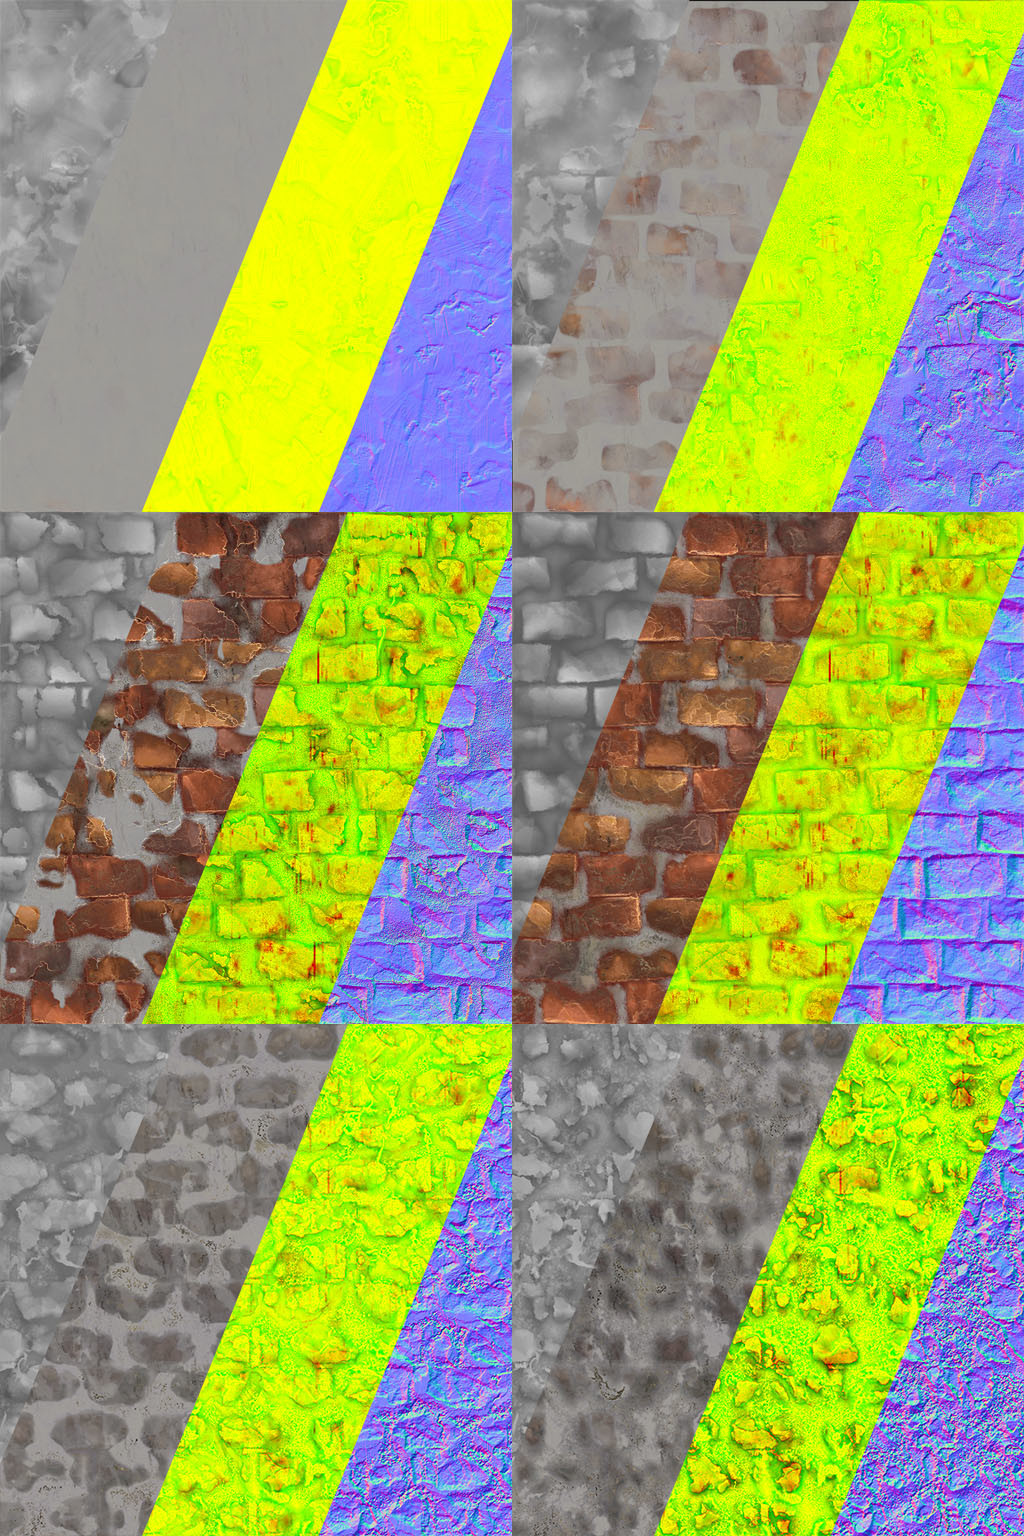 Jona marklund biweeklysubstance01 brickwall textures